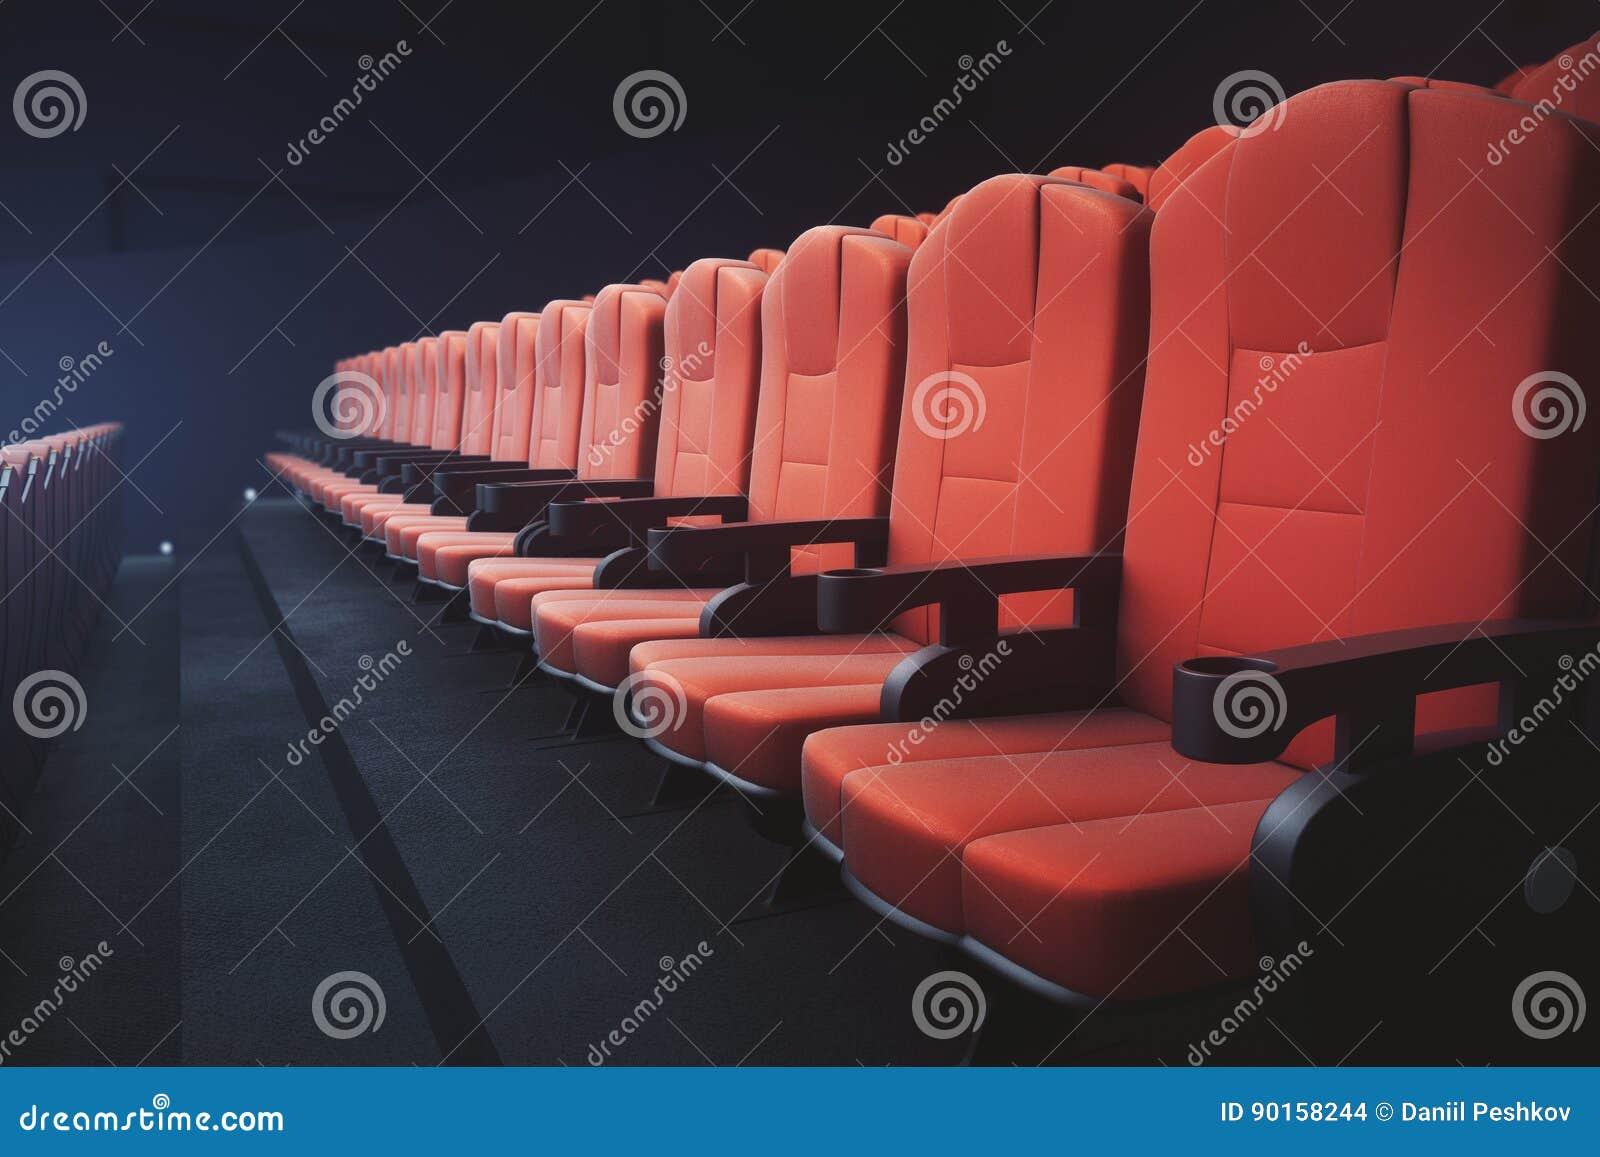 Red cinema chairs seats stock illustration  Illustration of music